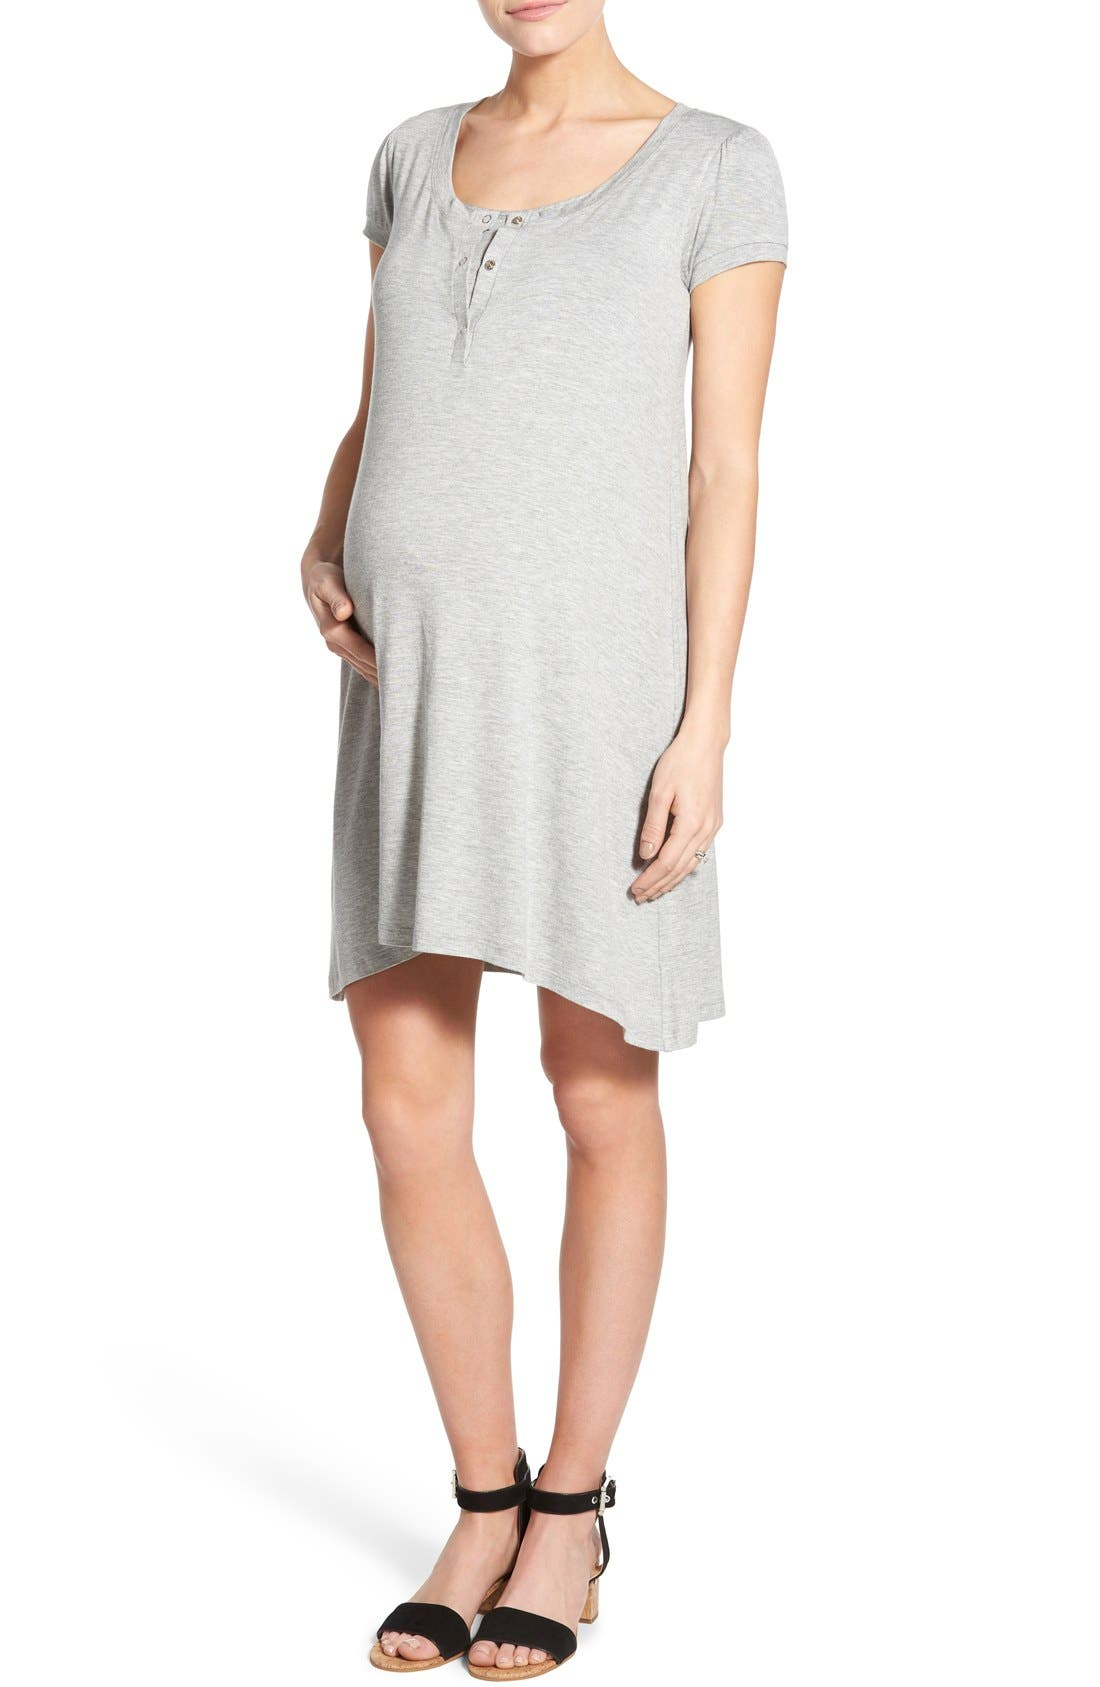 Alternate Image 1 Selected - LAB40 'Poppy' Maternity/Nursing Swing Dress